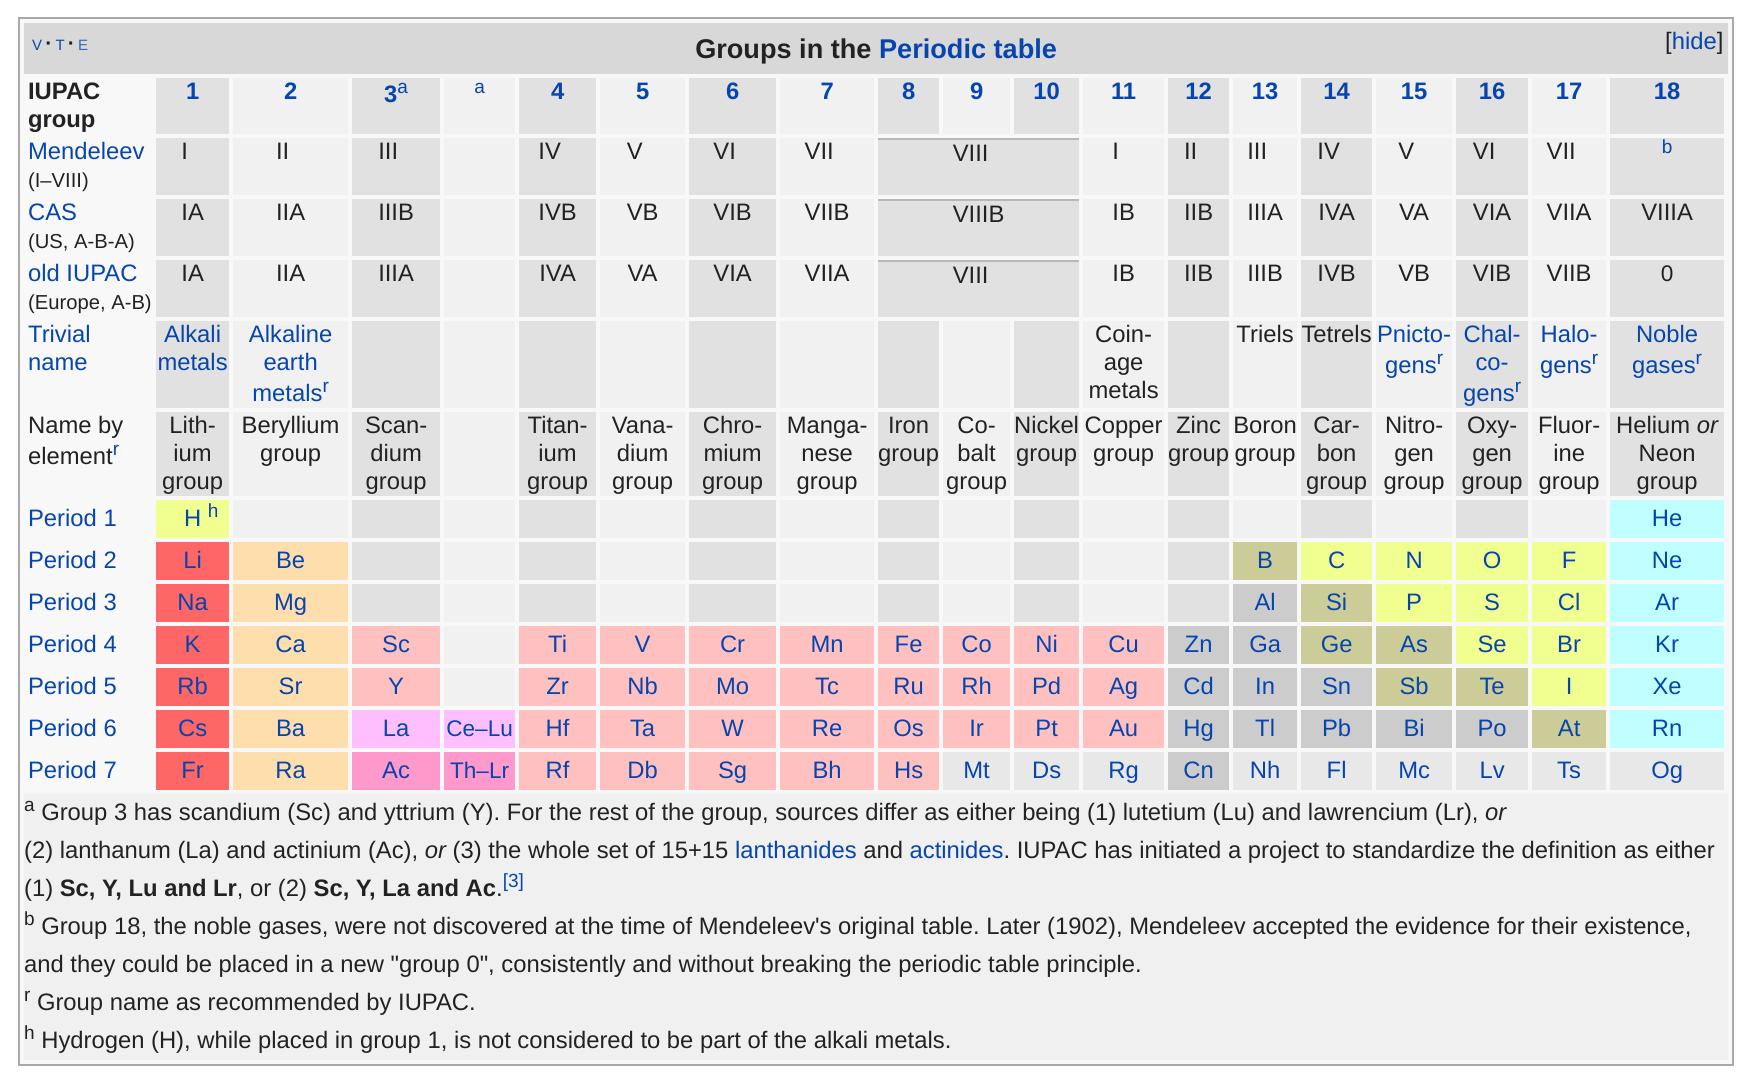 https://en.wikipedia.org/wiki/Group_(periodic_table)